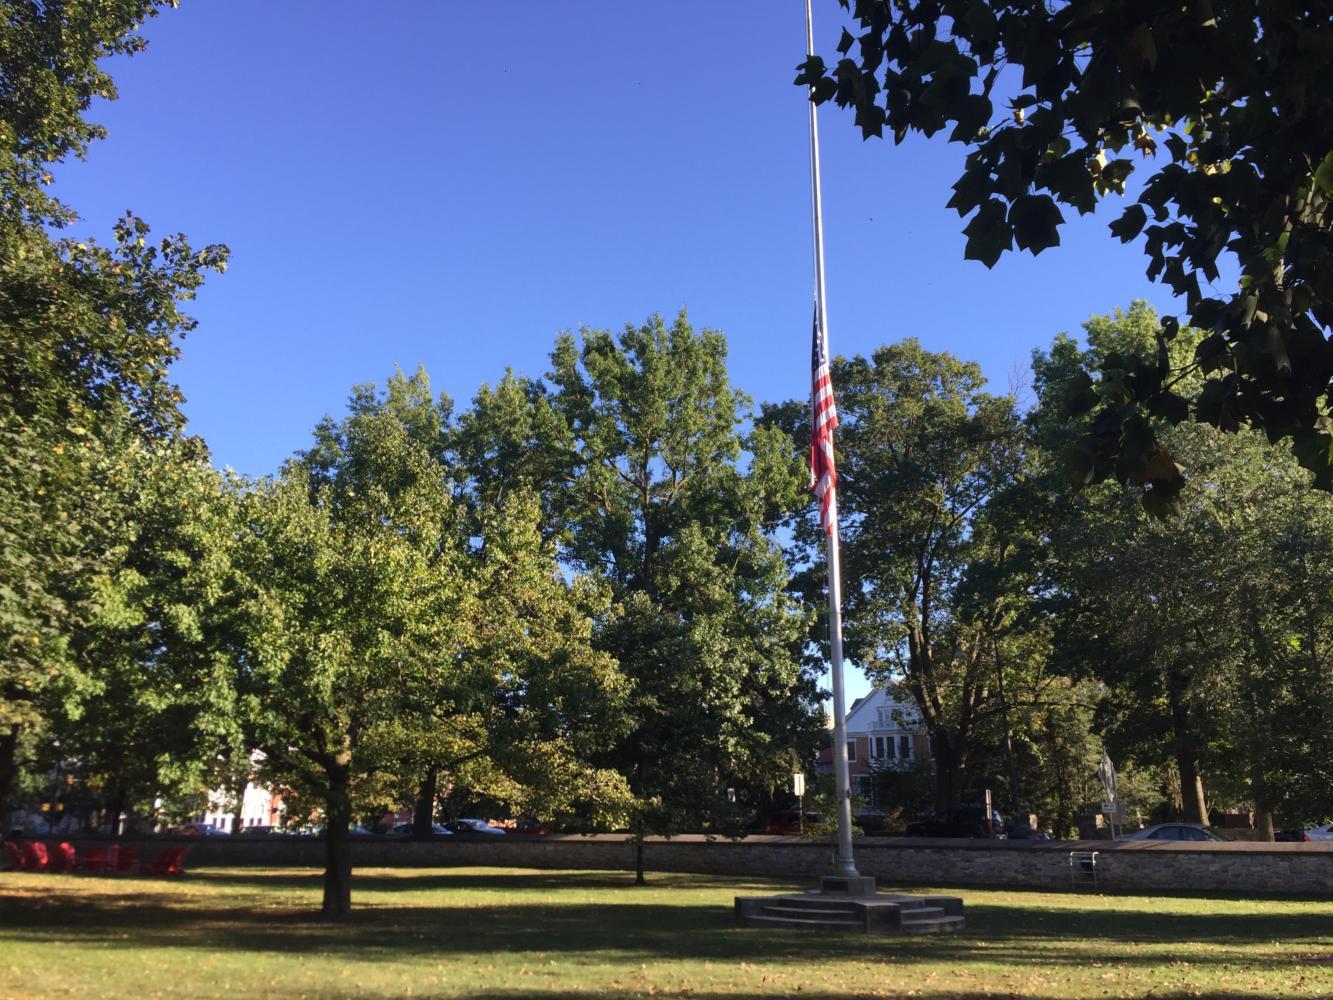 Dickinson's flag flew at half-staff on Oct. 2.